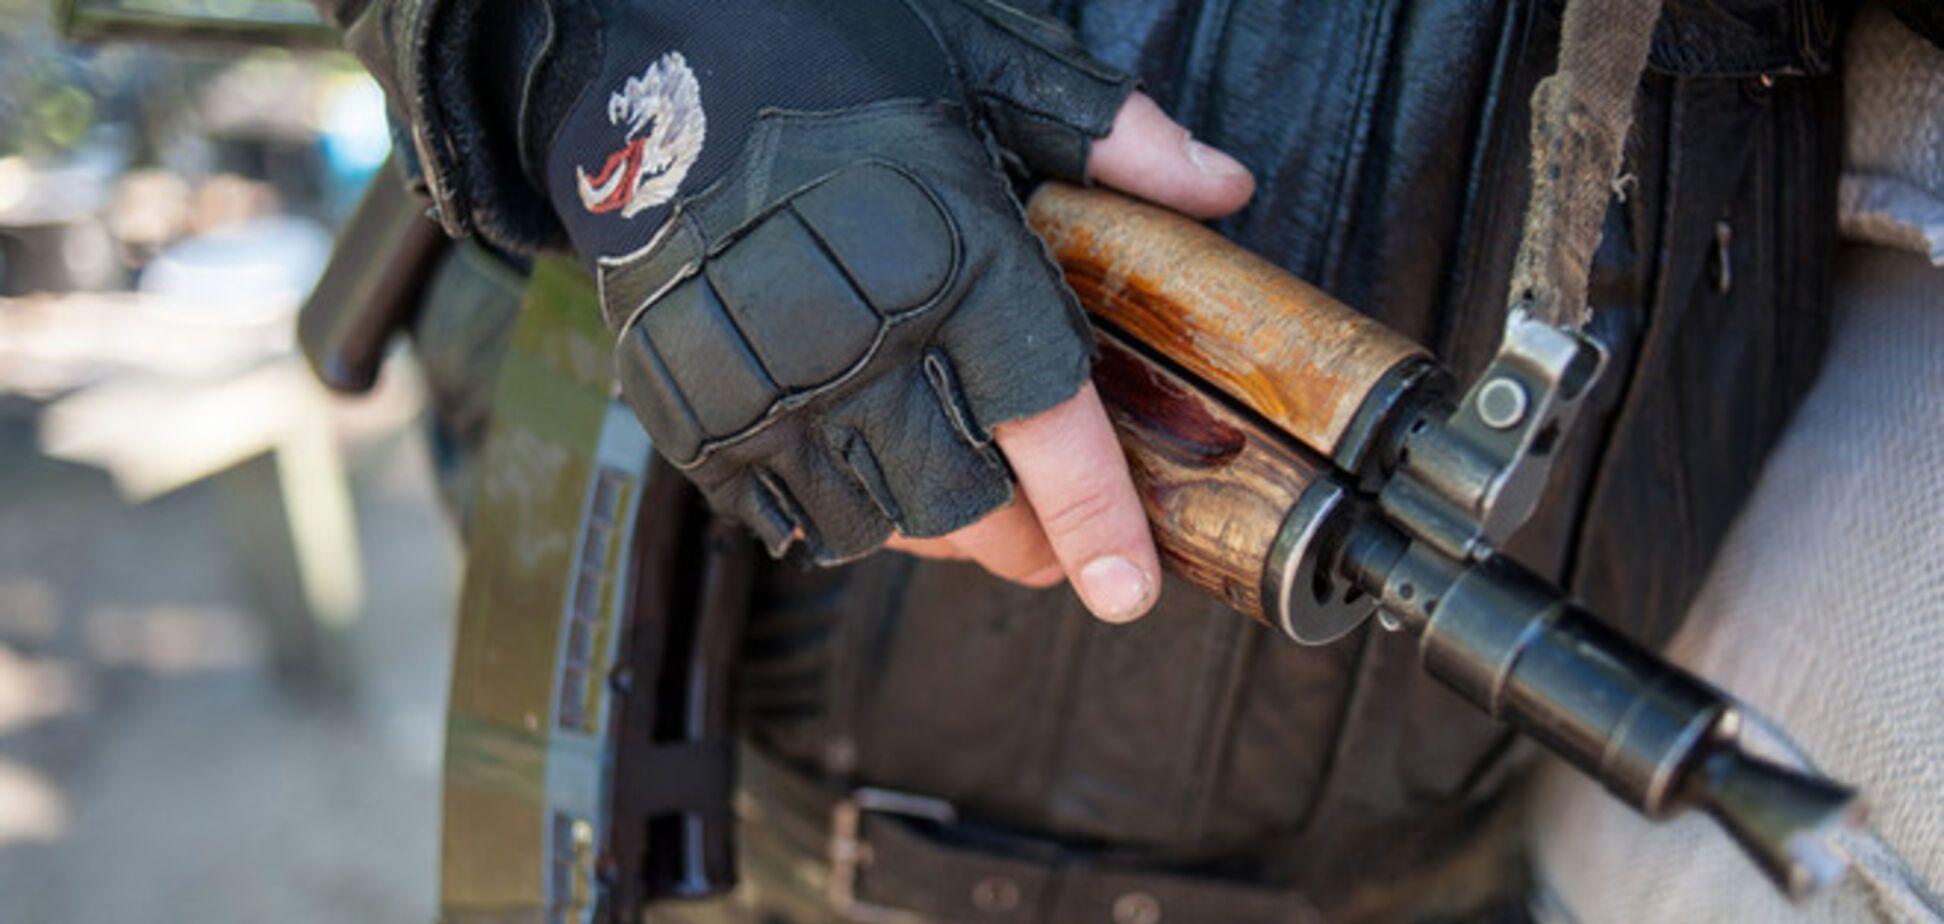 Тымчук: боевики заняли детский сад в Славянске